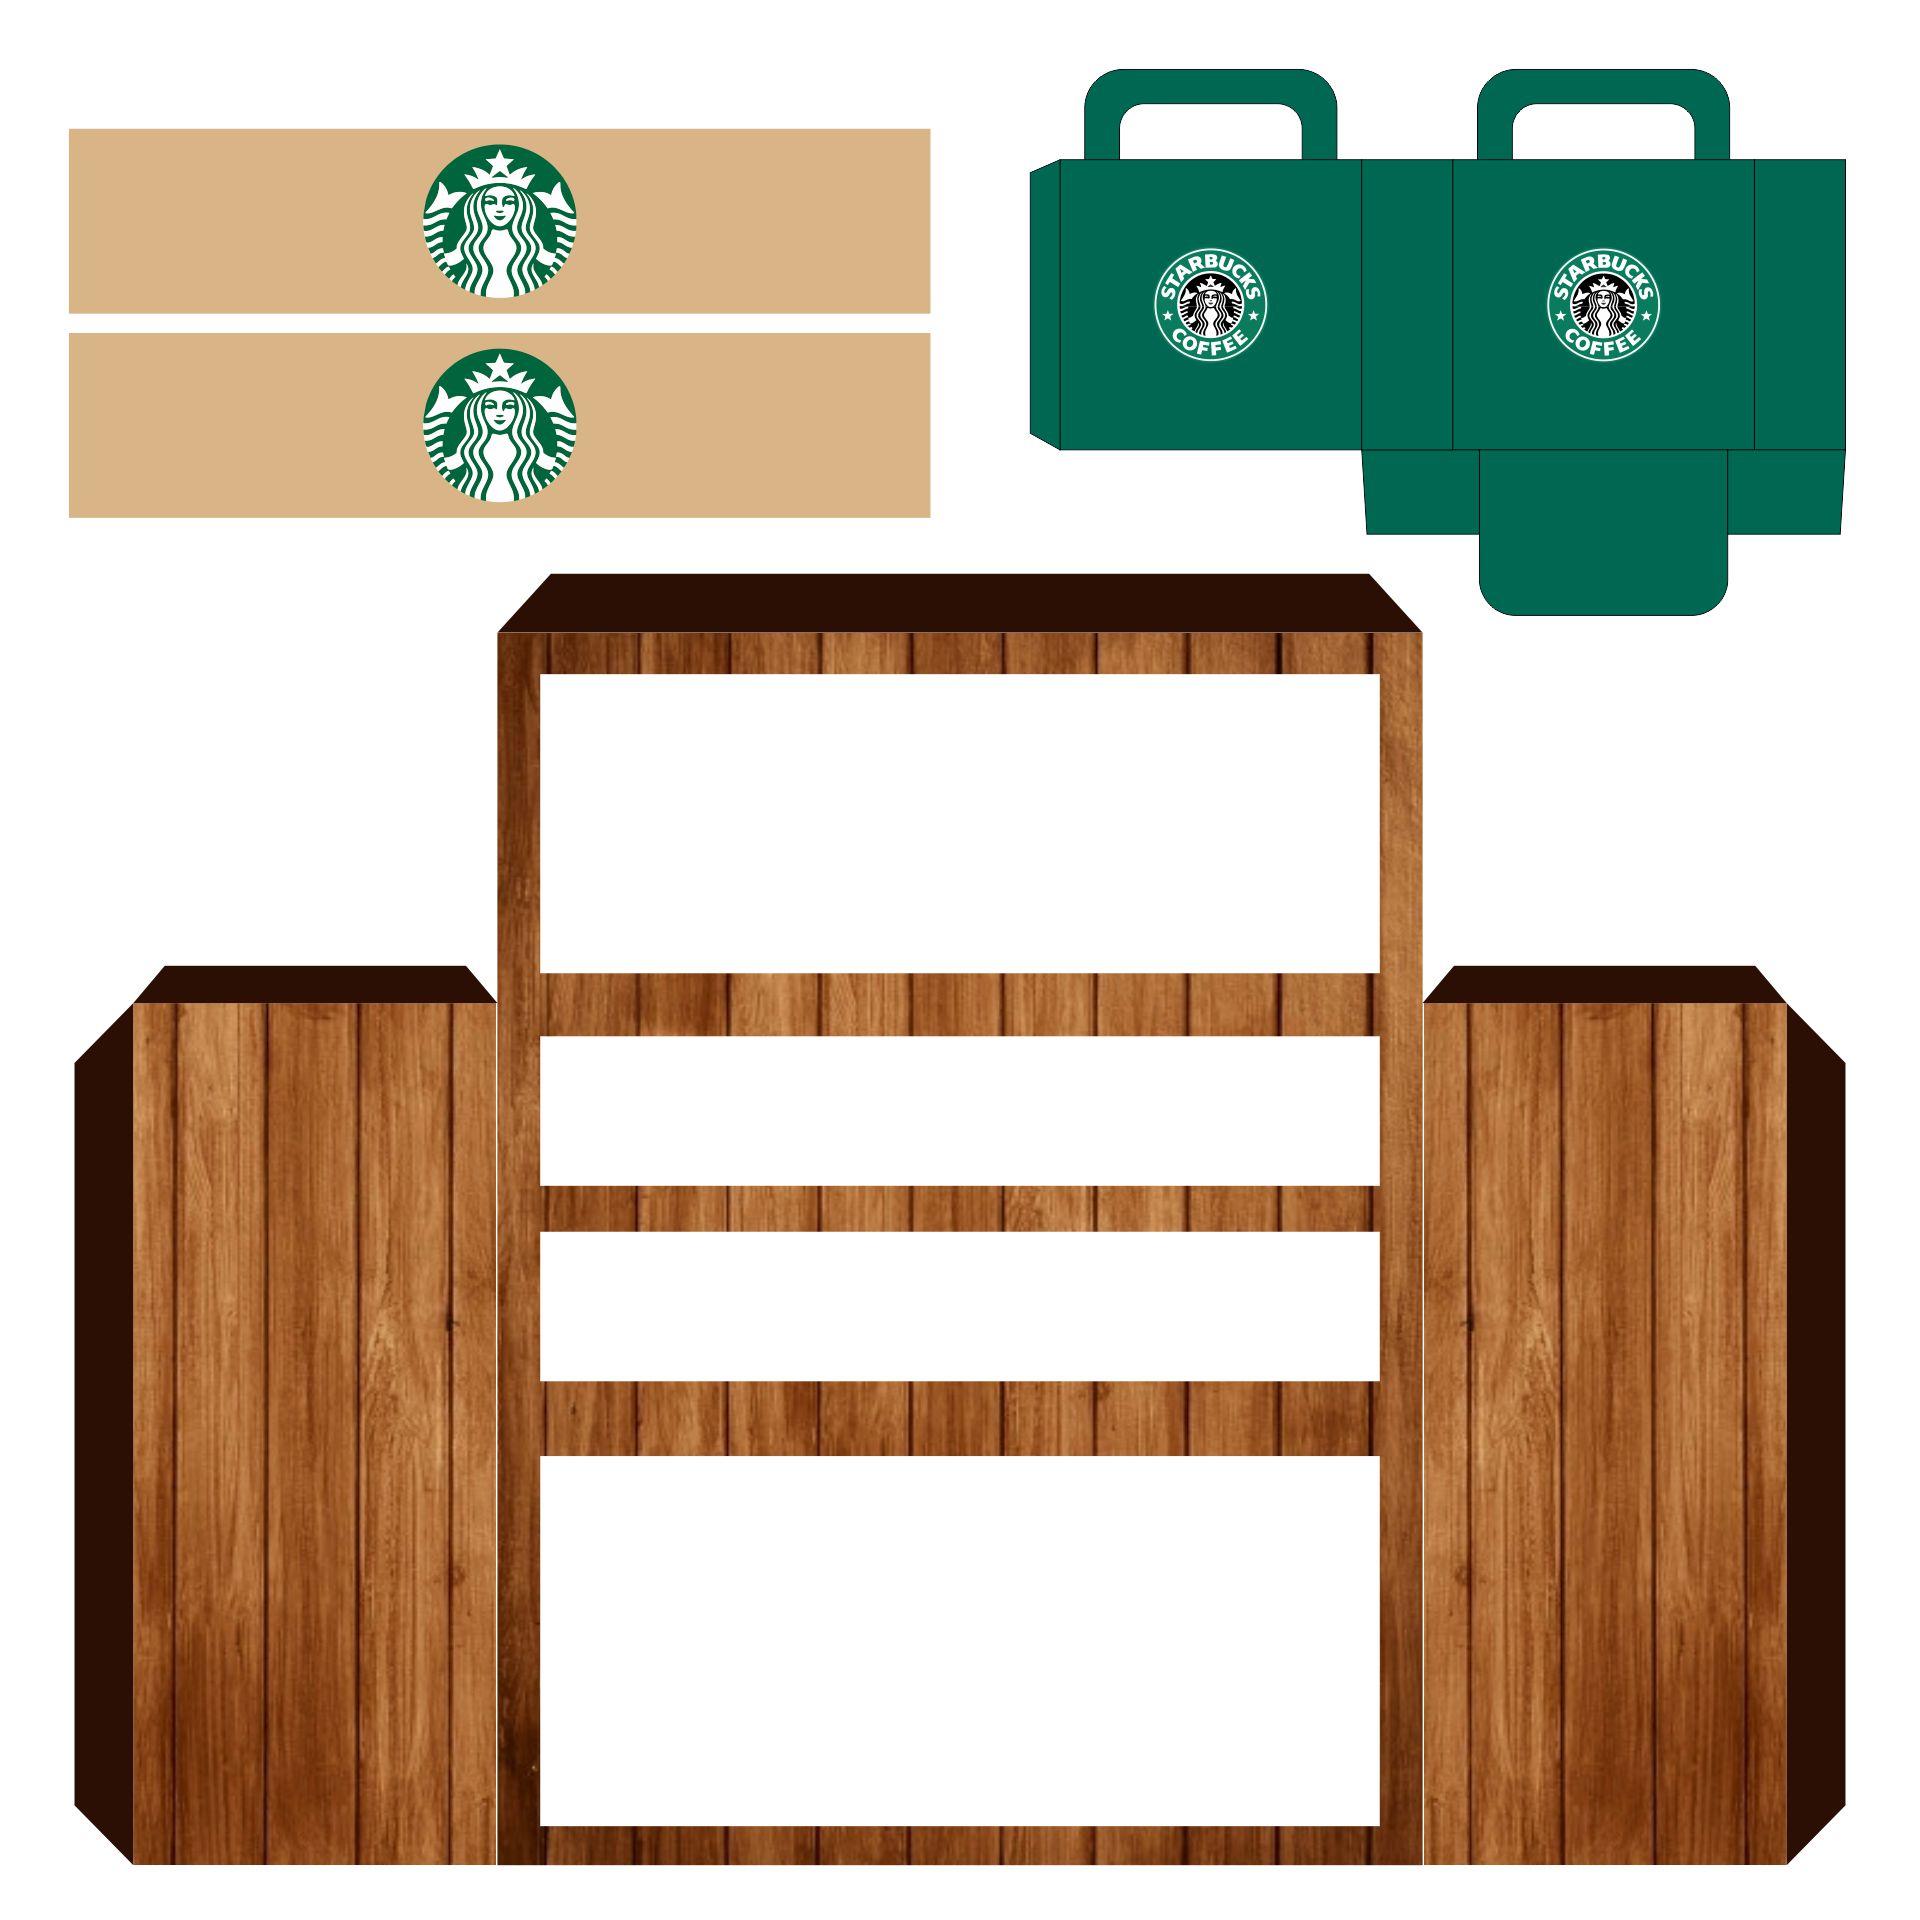 DIY Miniature Starbucks Coffee Cafe For Dools